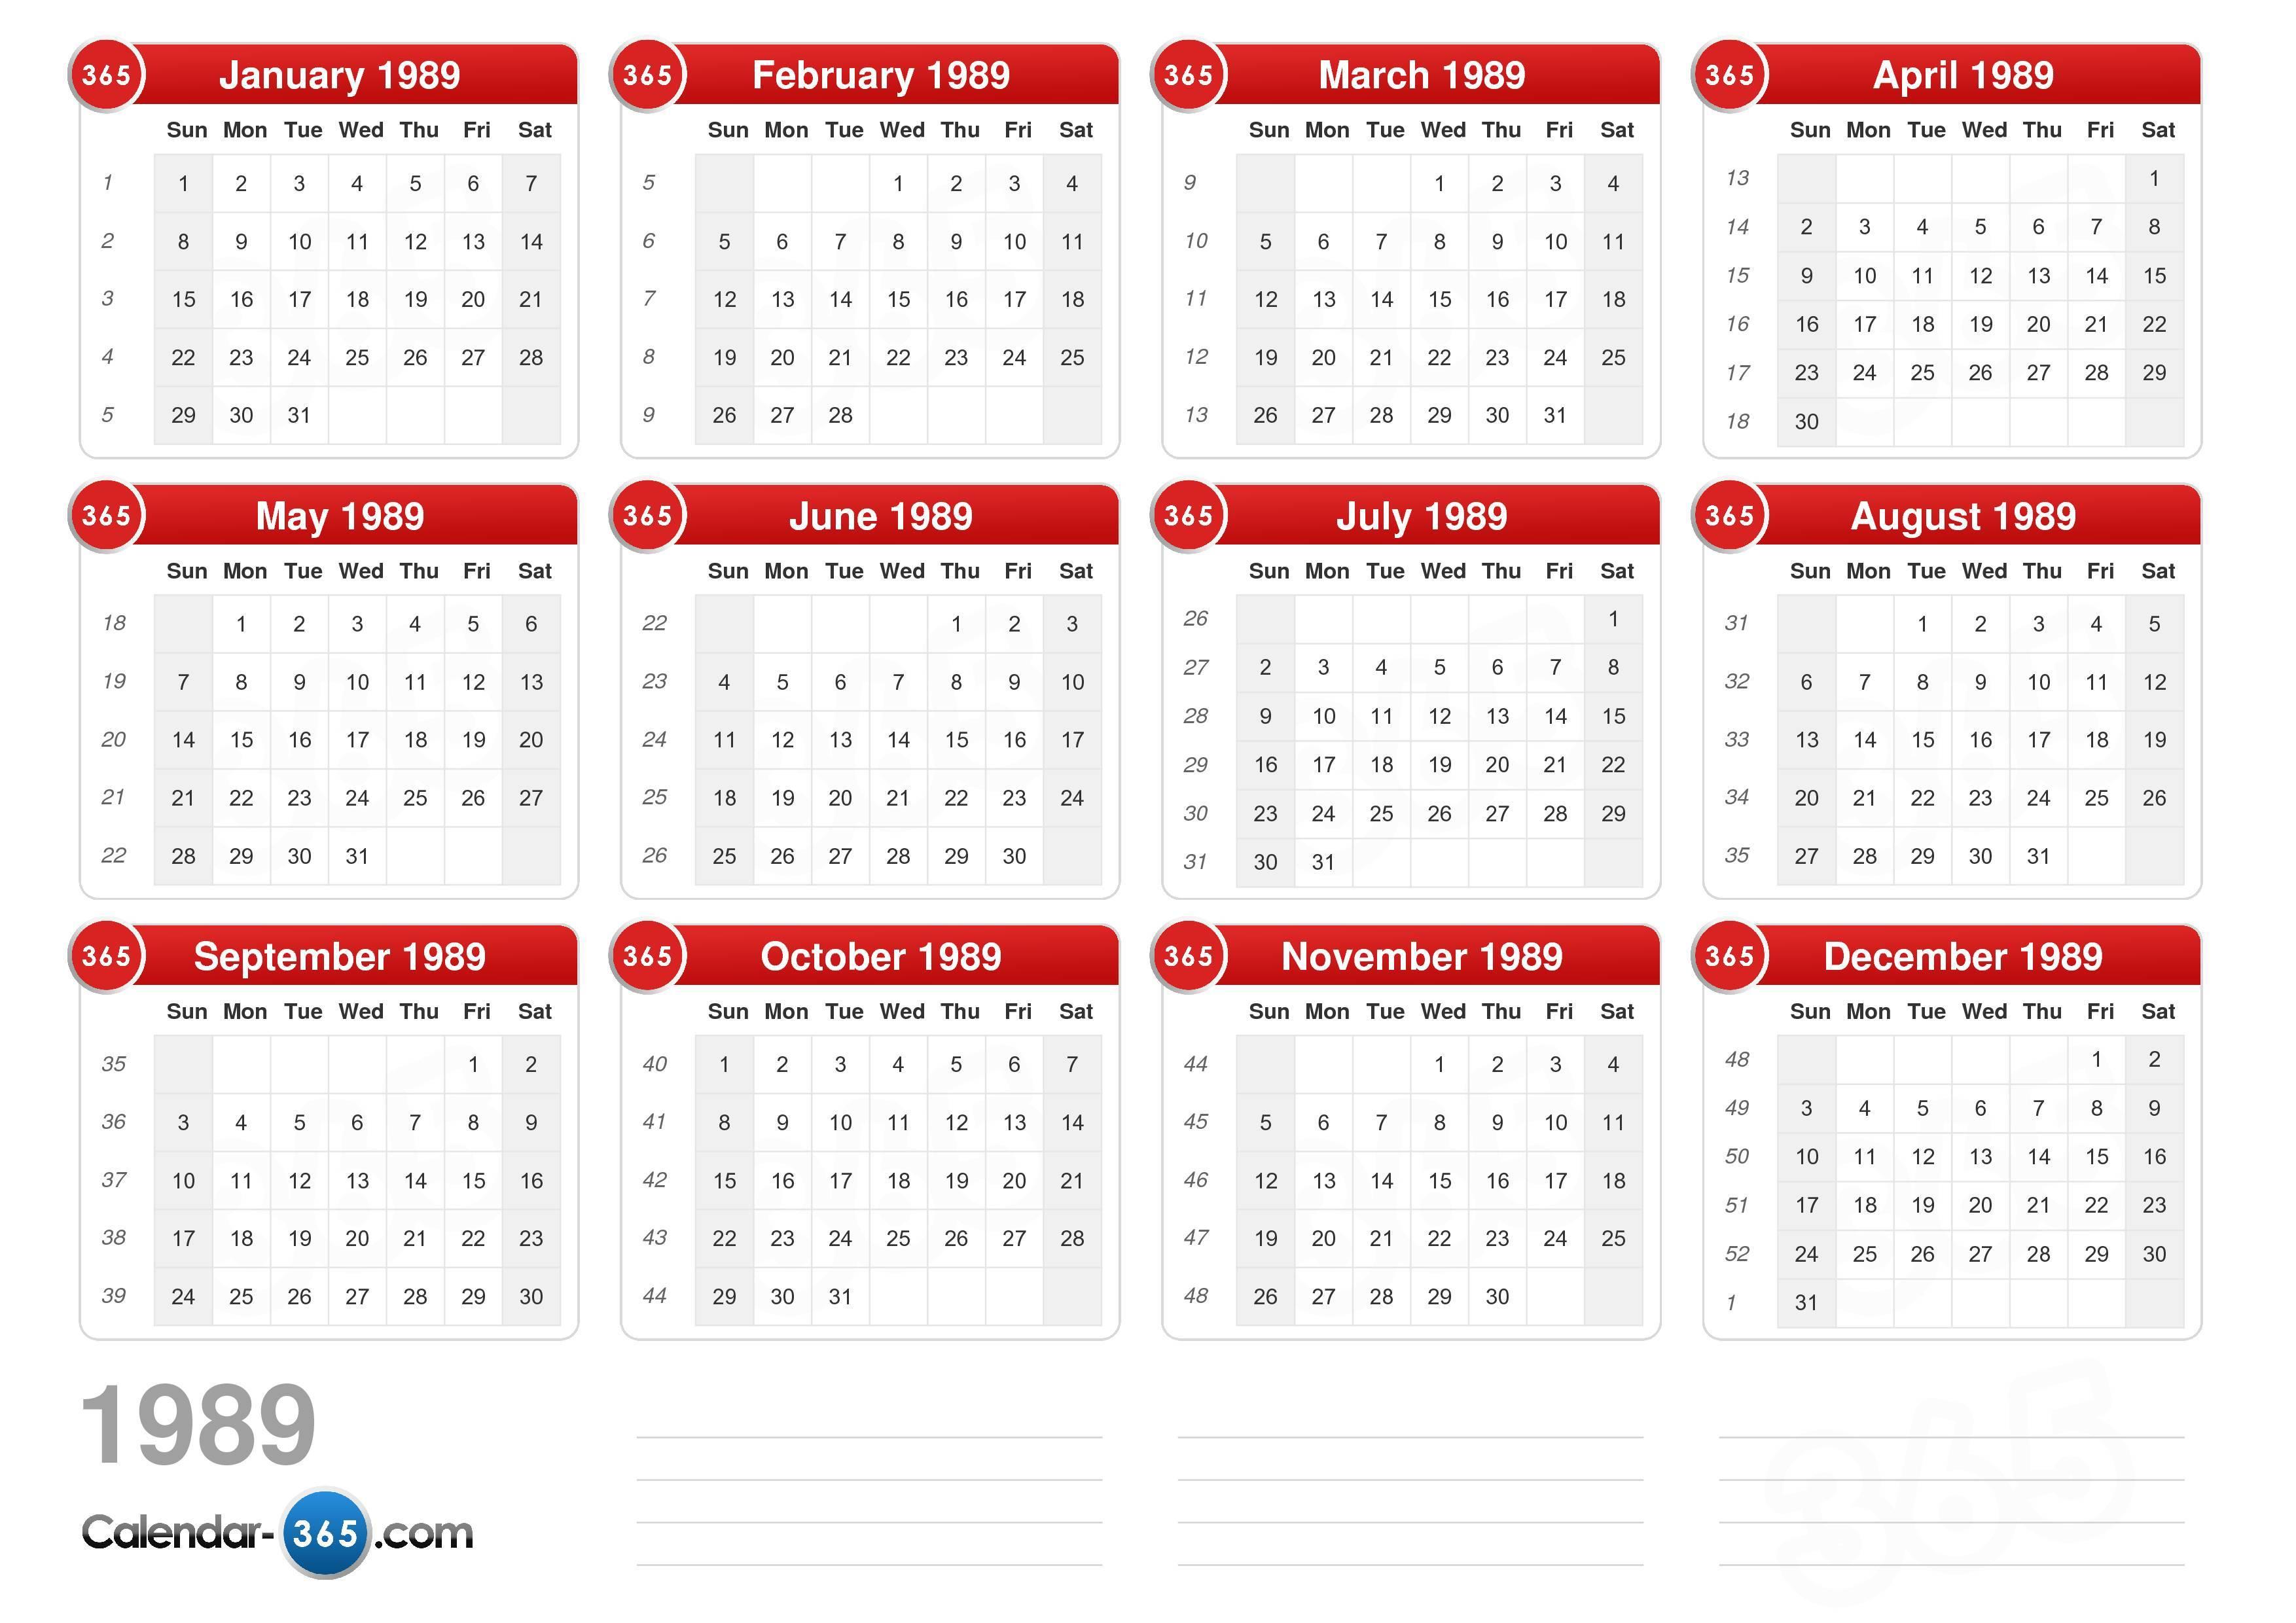 ... calendar without holidays landscape format 1 page 1989 calendar 189